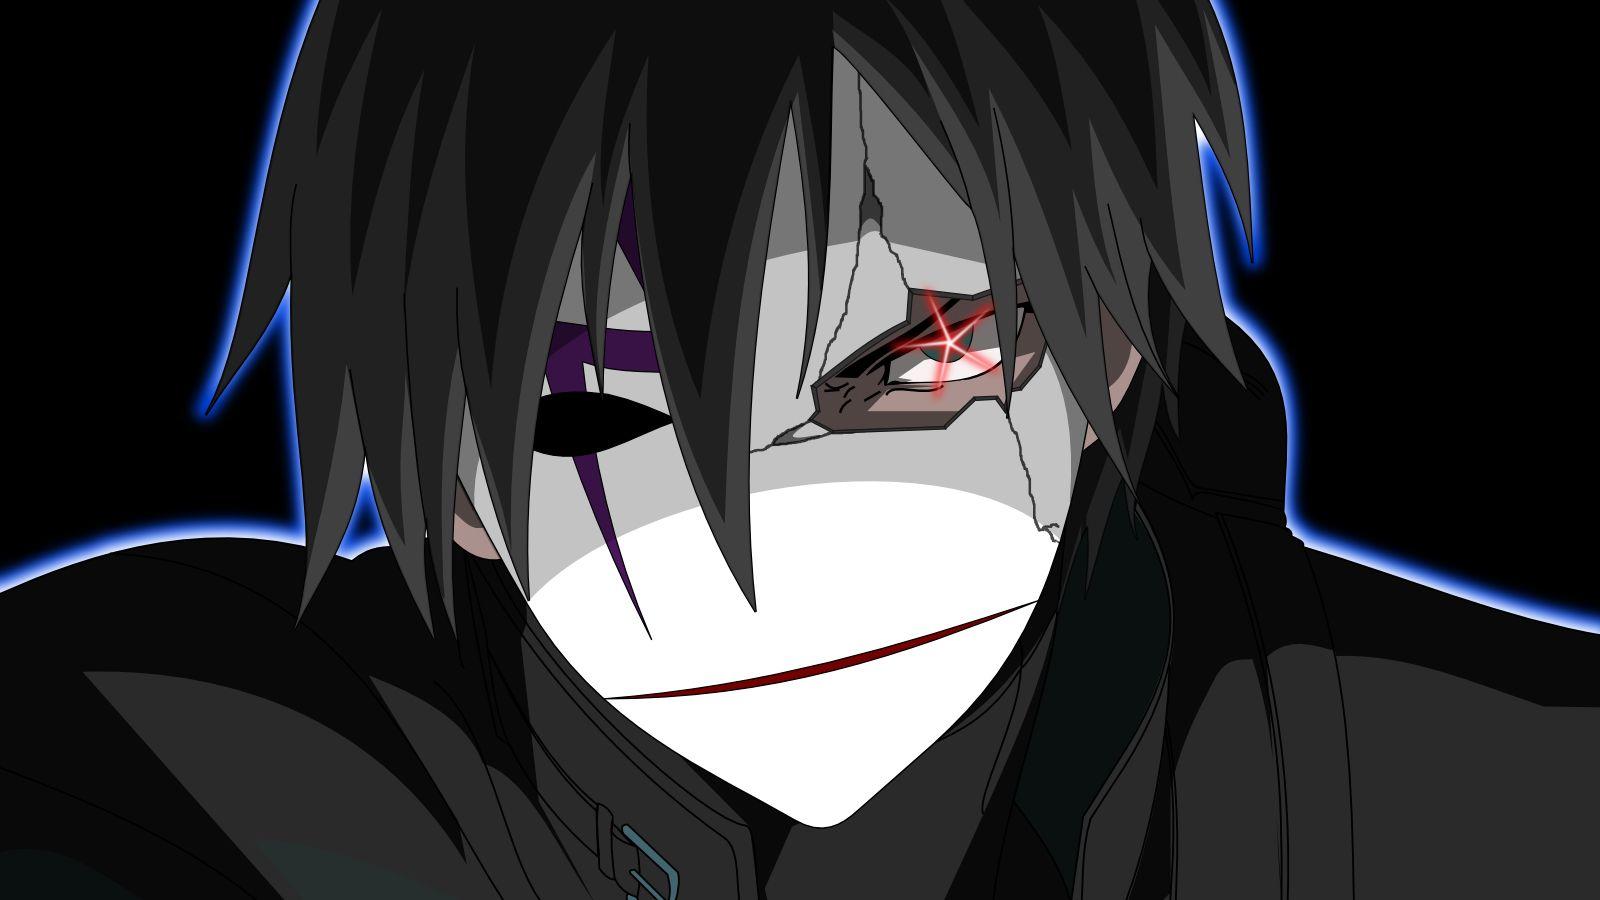 Hei Bk 201 Darker Than Black Sigh Dark Anime Anime Magic System